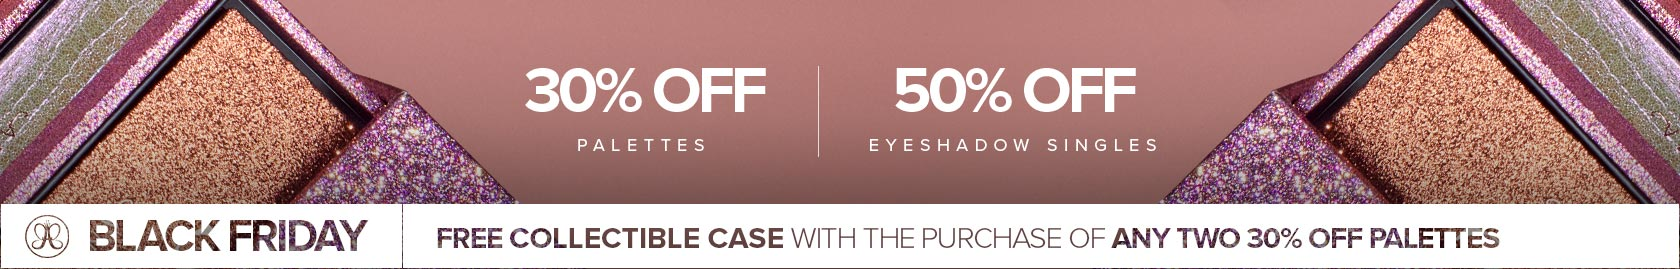 30% off Palettes | 50% Eyeshadow Singles